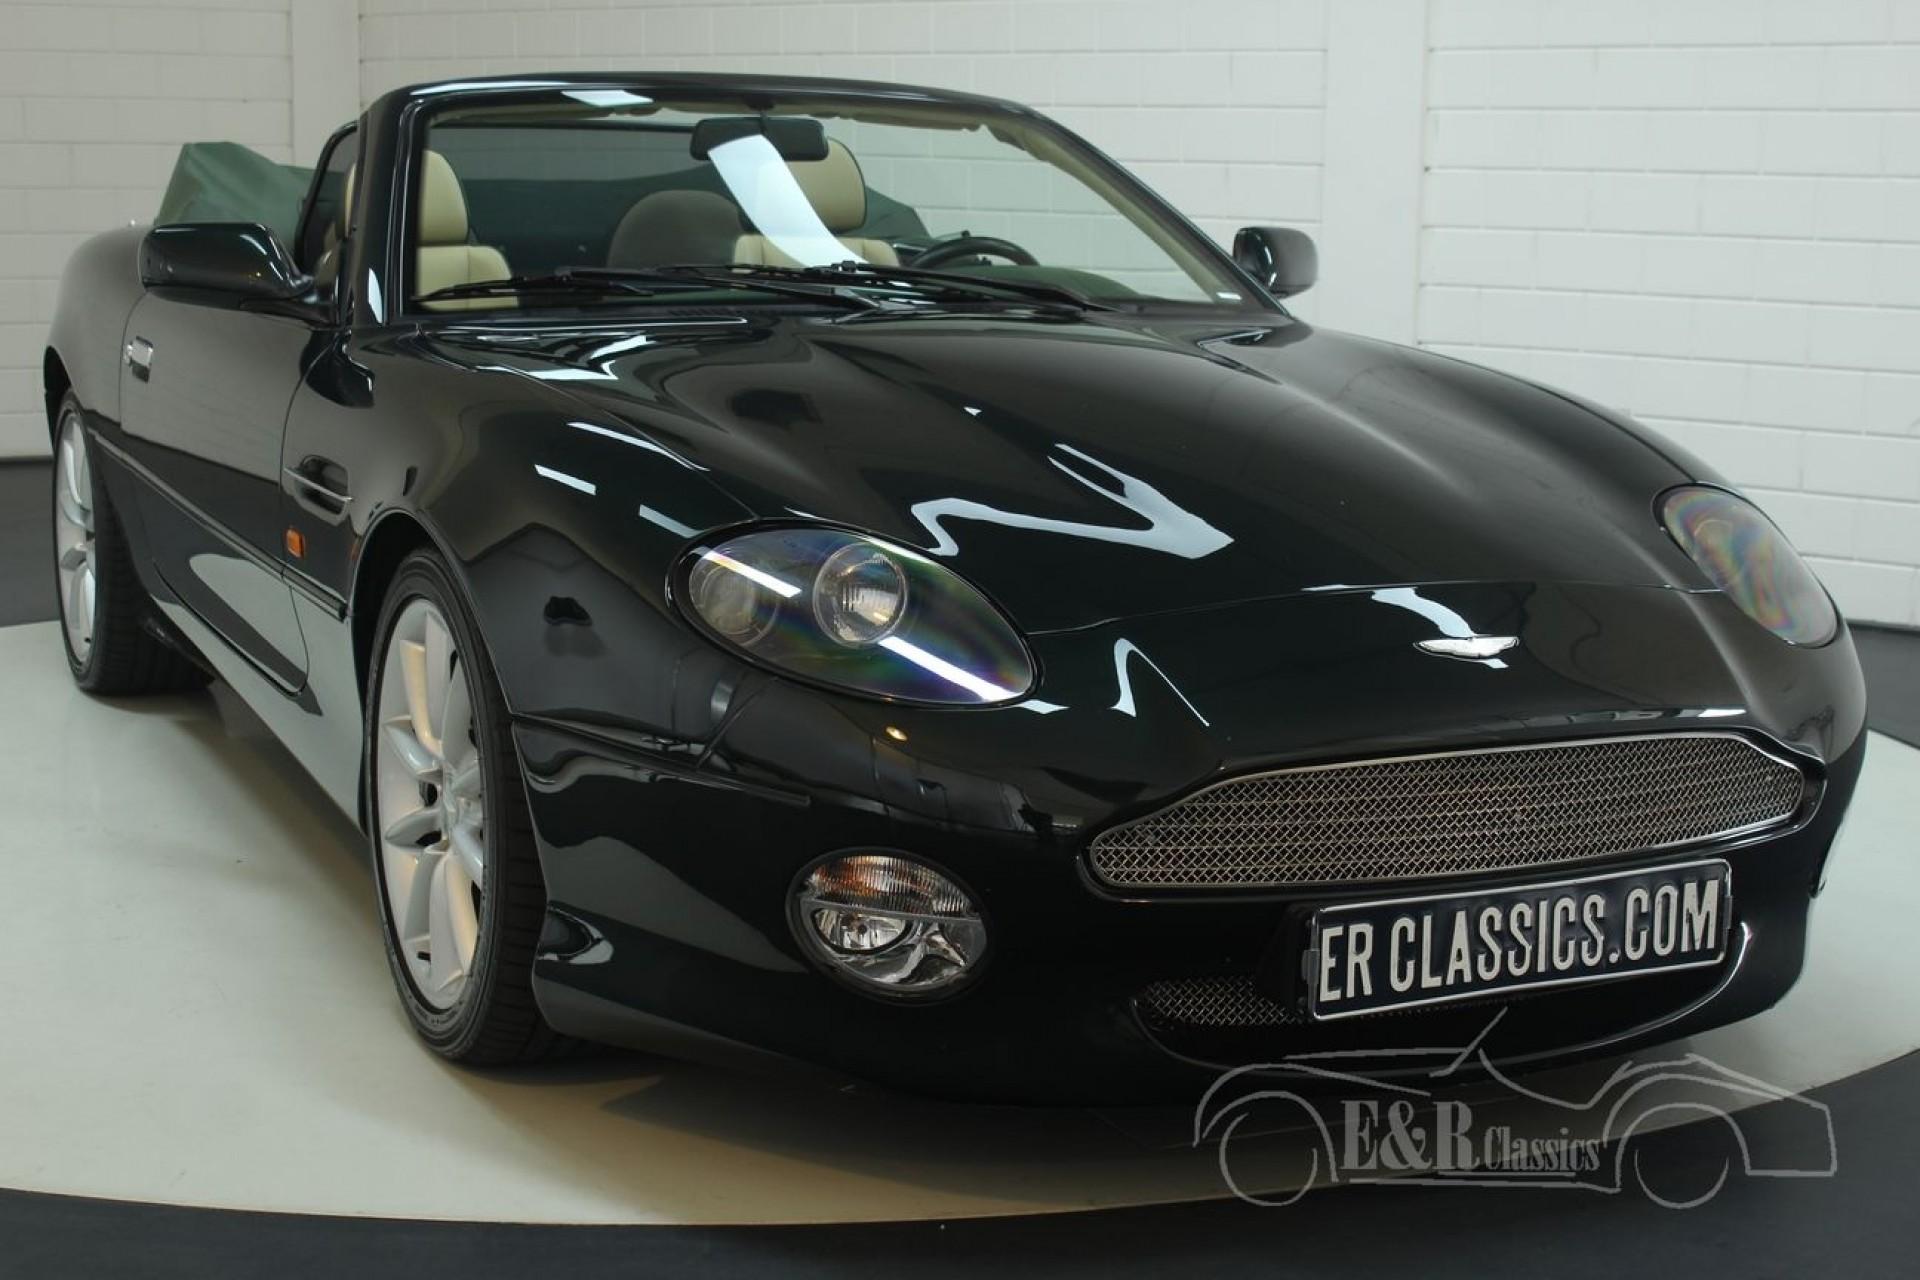 Aston Martin Db7 V12 2001 For Sale At Erclassics